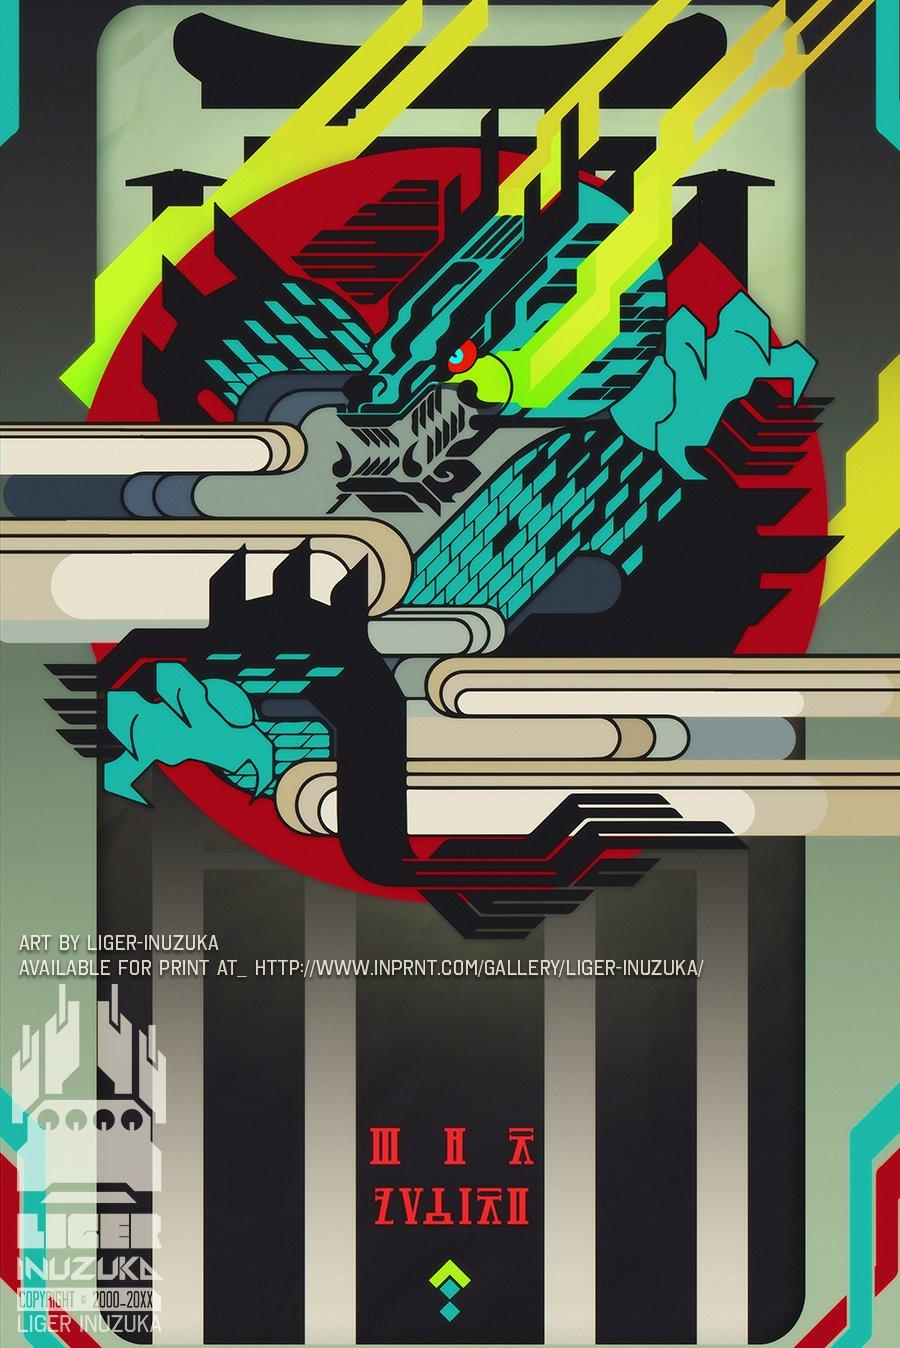 Liger inuzuka flux virtus graphic poster v2 ready for upload